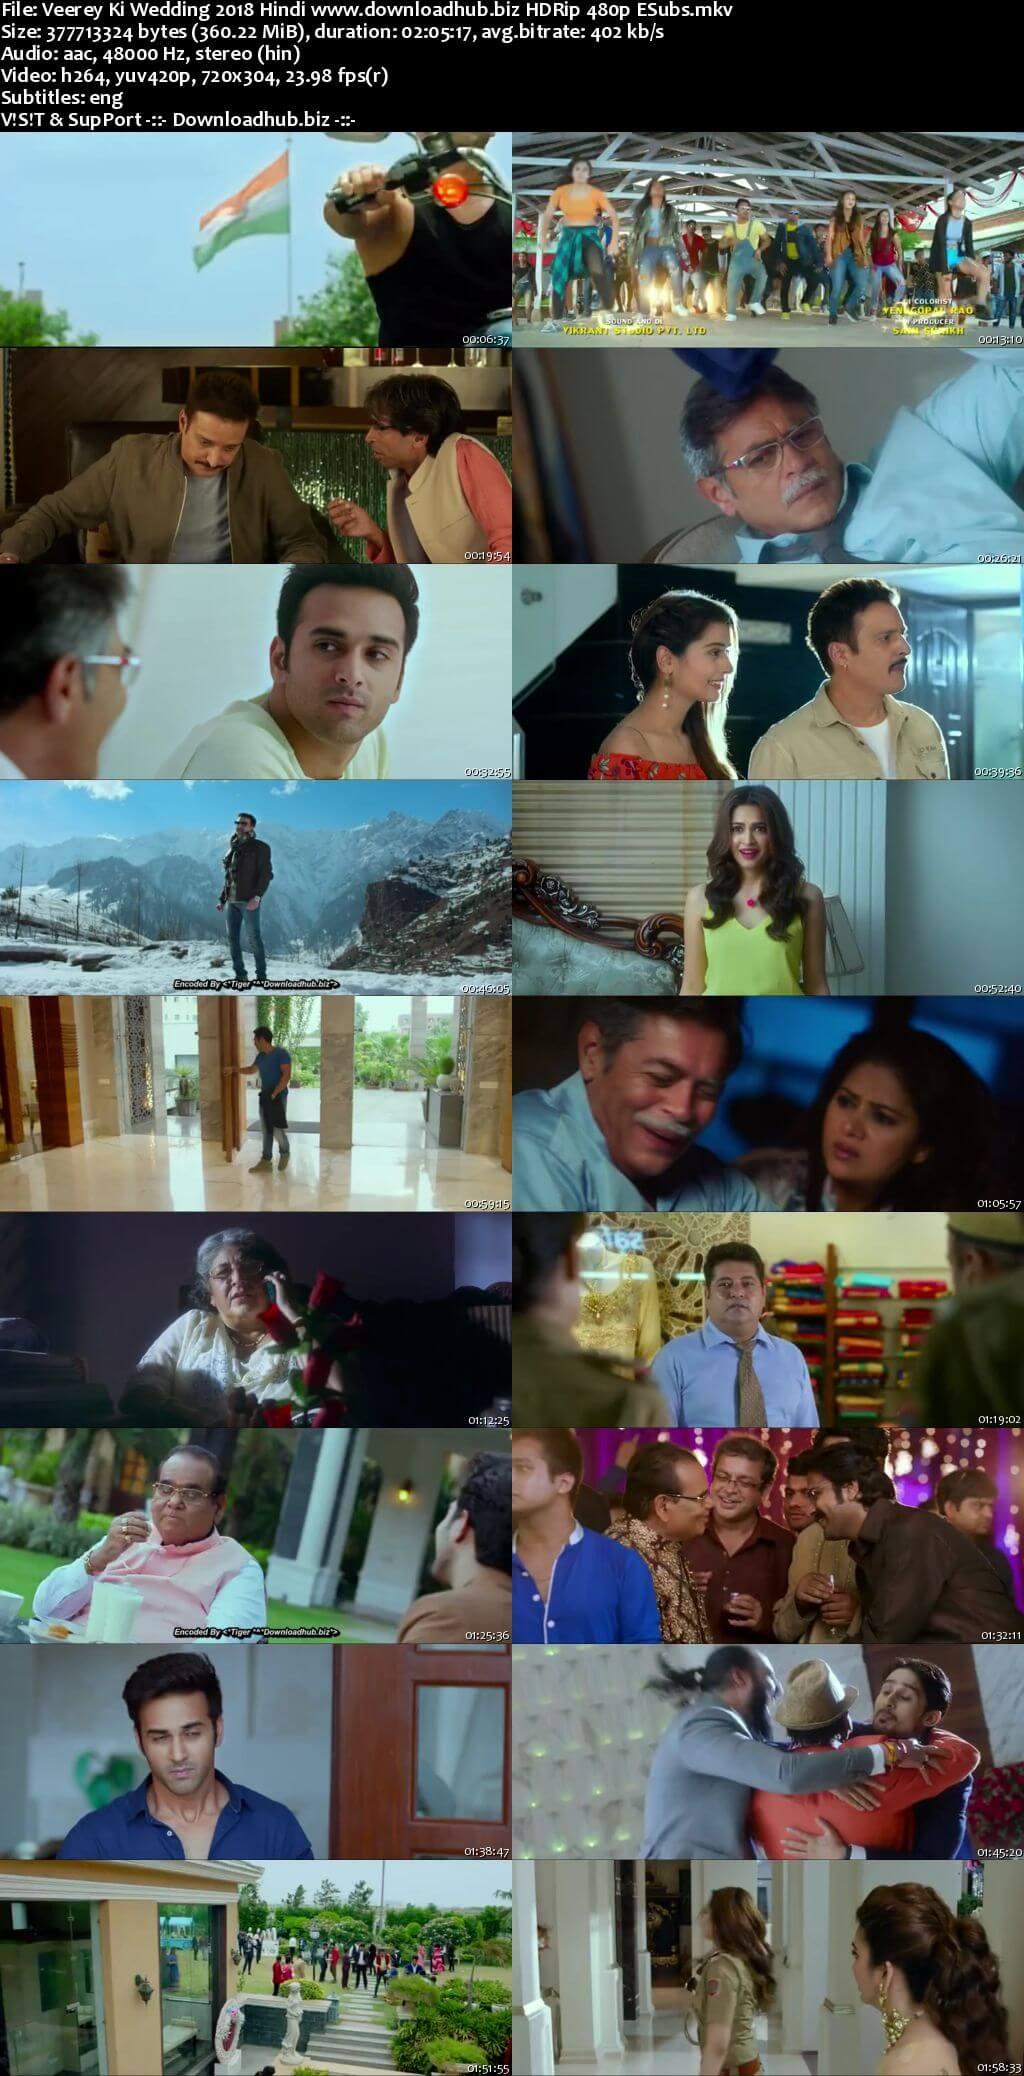 Veerey Ki Wedding 2018 Hindi 350MB HDRip 480p ESubs